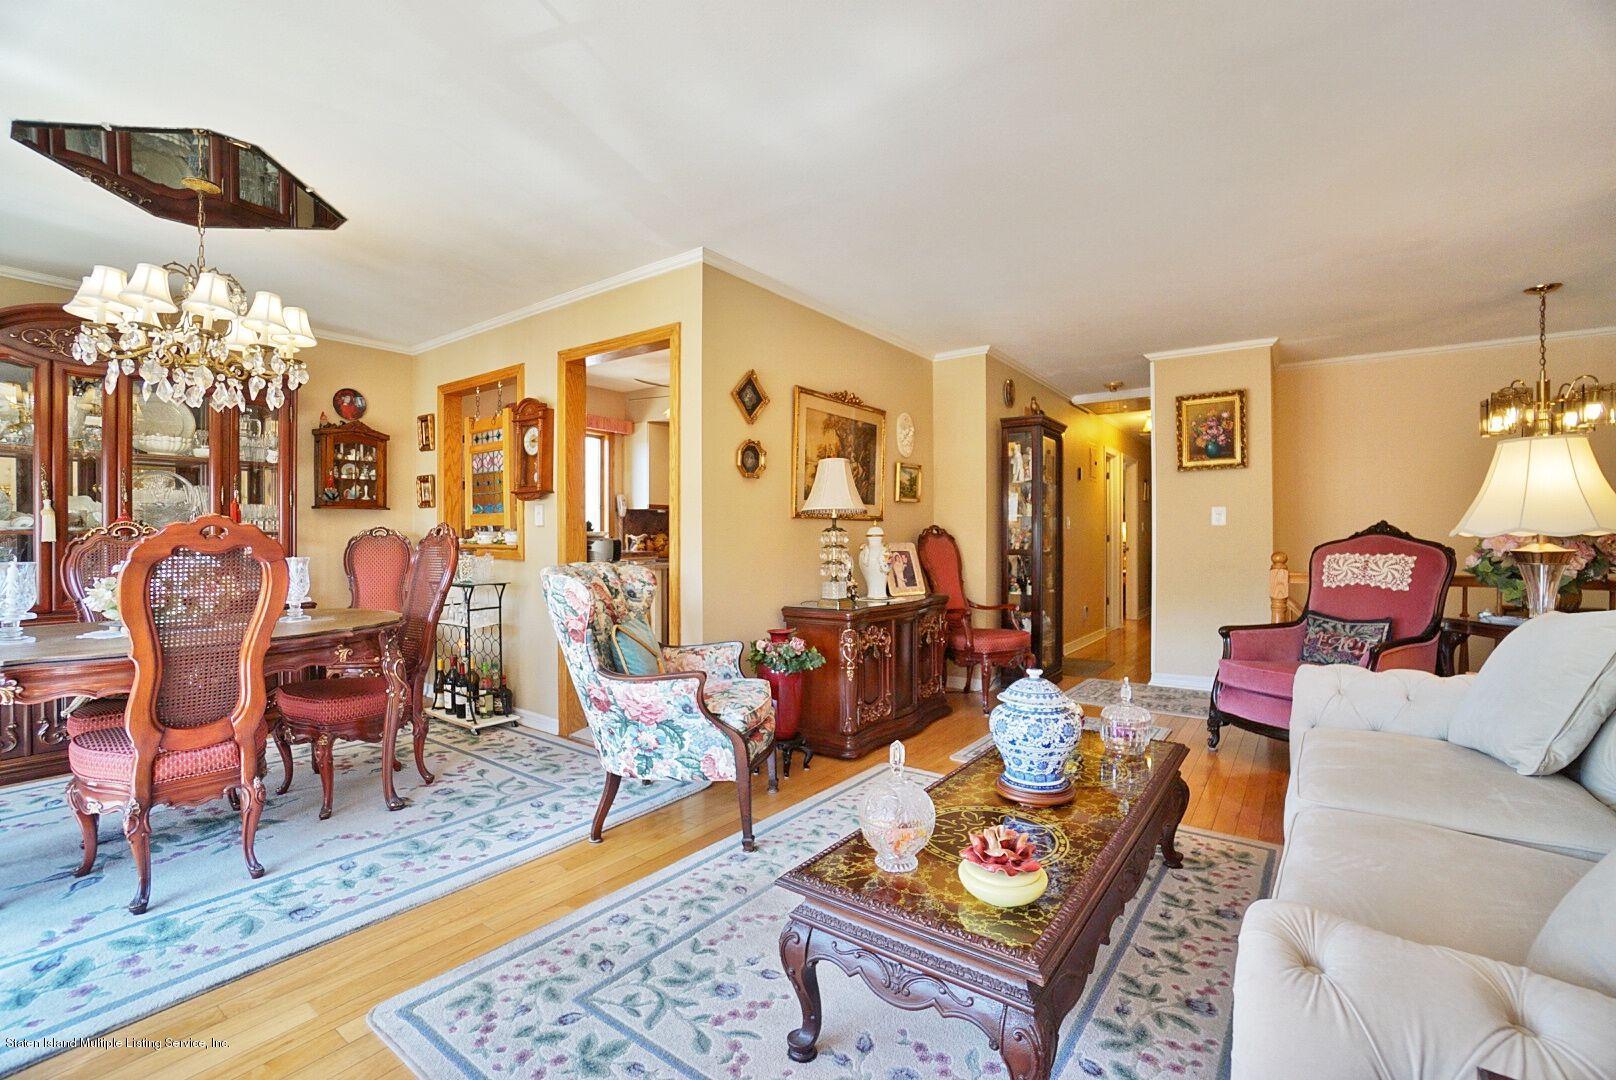 Single Family - Detached 283 Holdridge Avenue  Staten Island, NY 10312, MLS-1130000-10